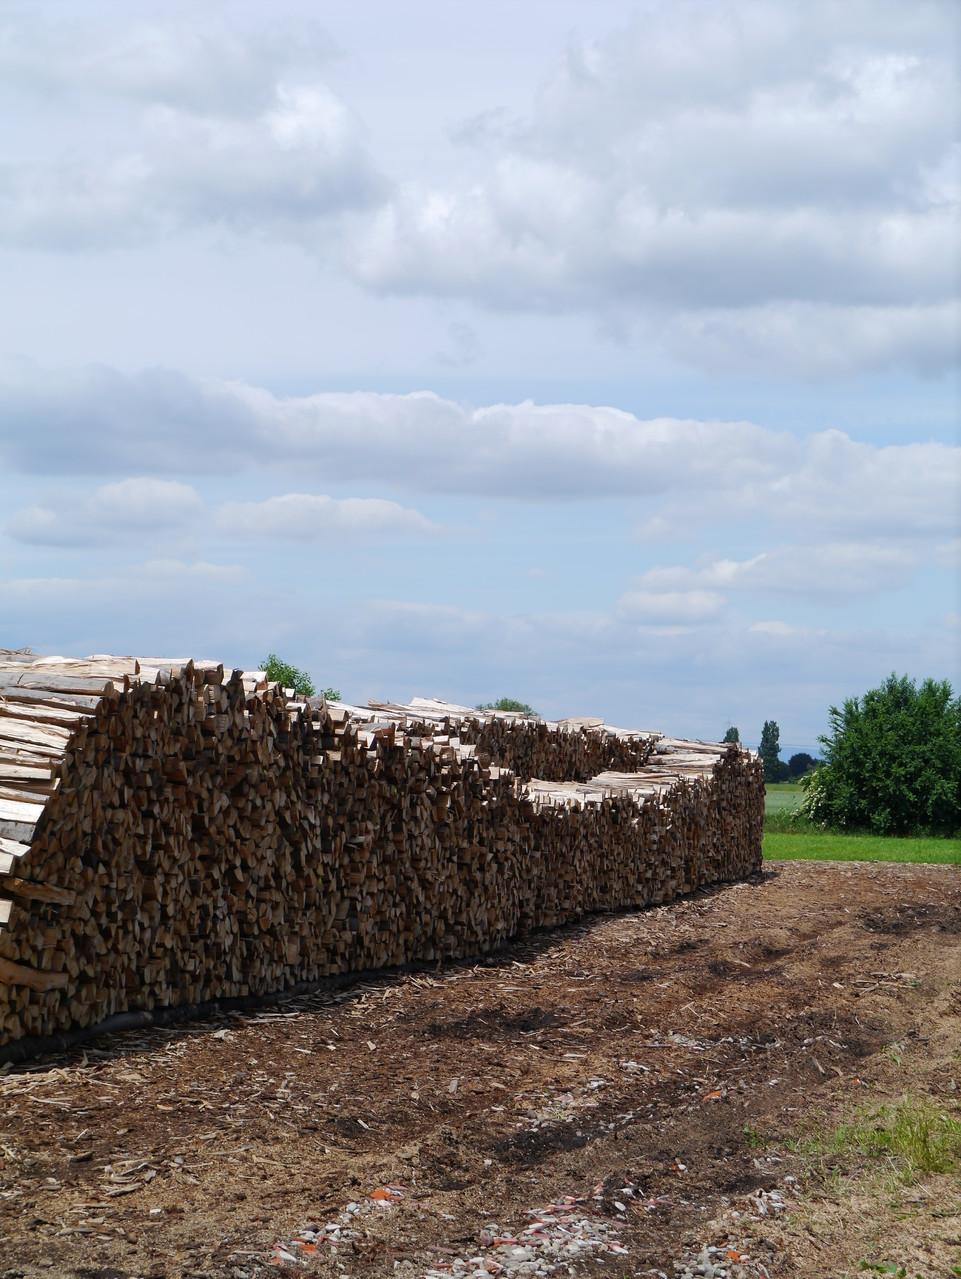 Holz für kalte Tage -Foto: Silke Bogorinski 2013